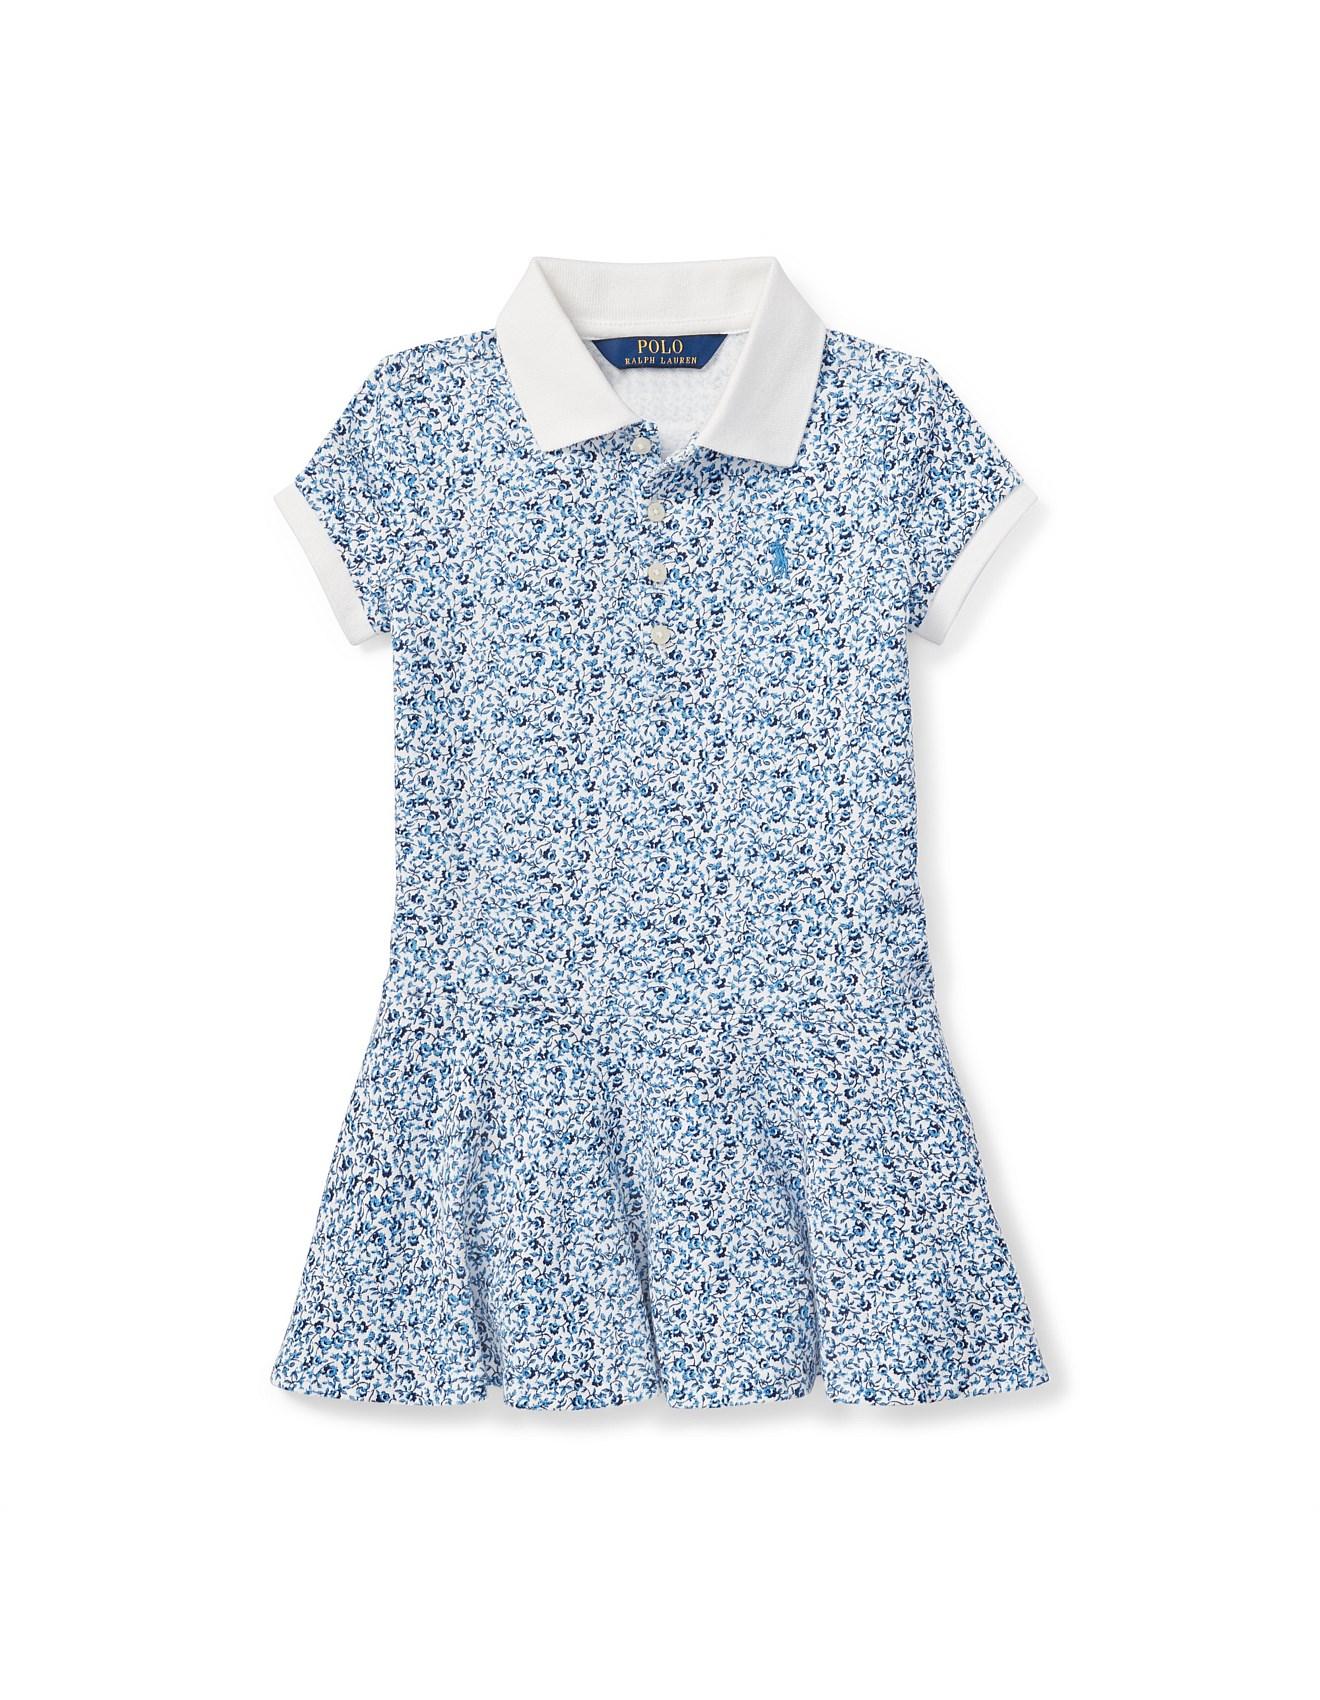 2e08b2e8221 Girls Clothing - Floral Stretch Mesh Polo Dress (2-3 Years)